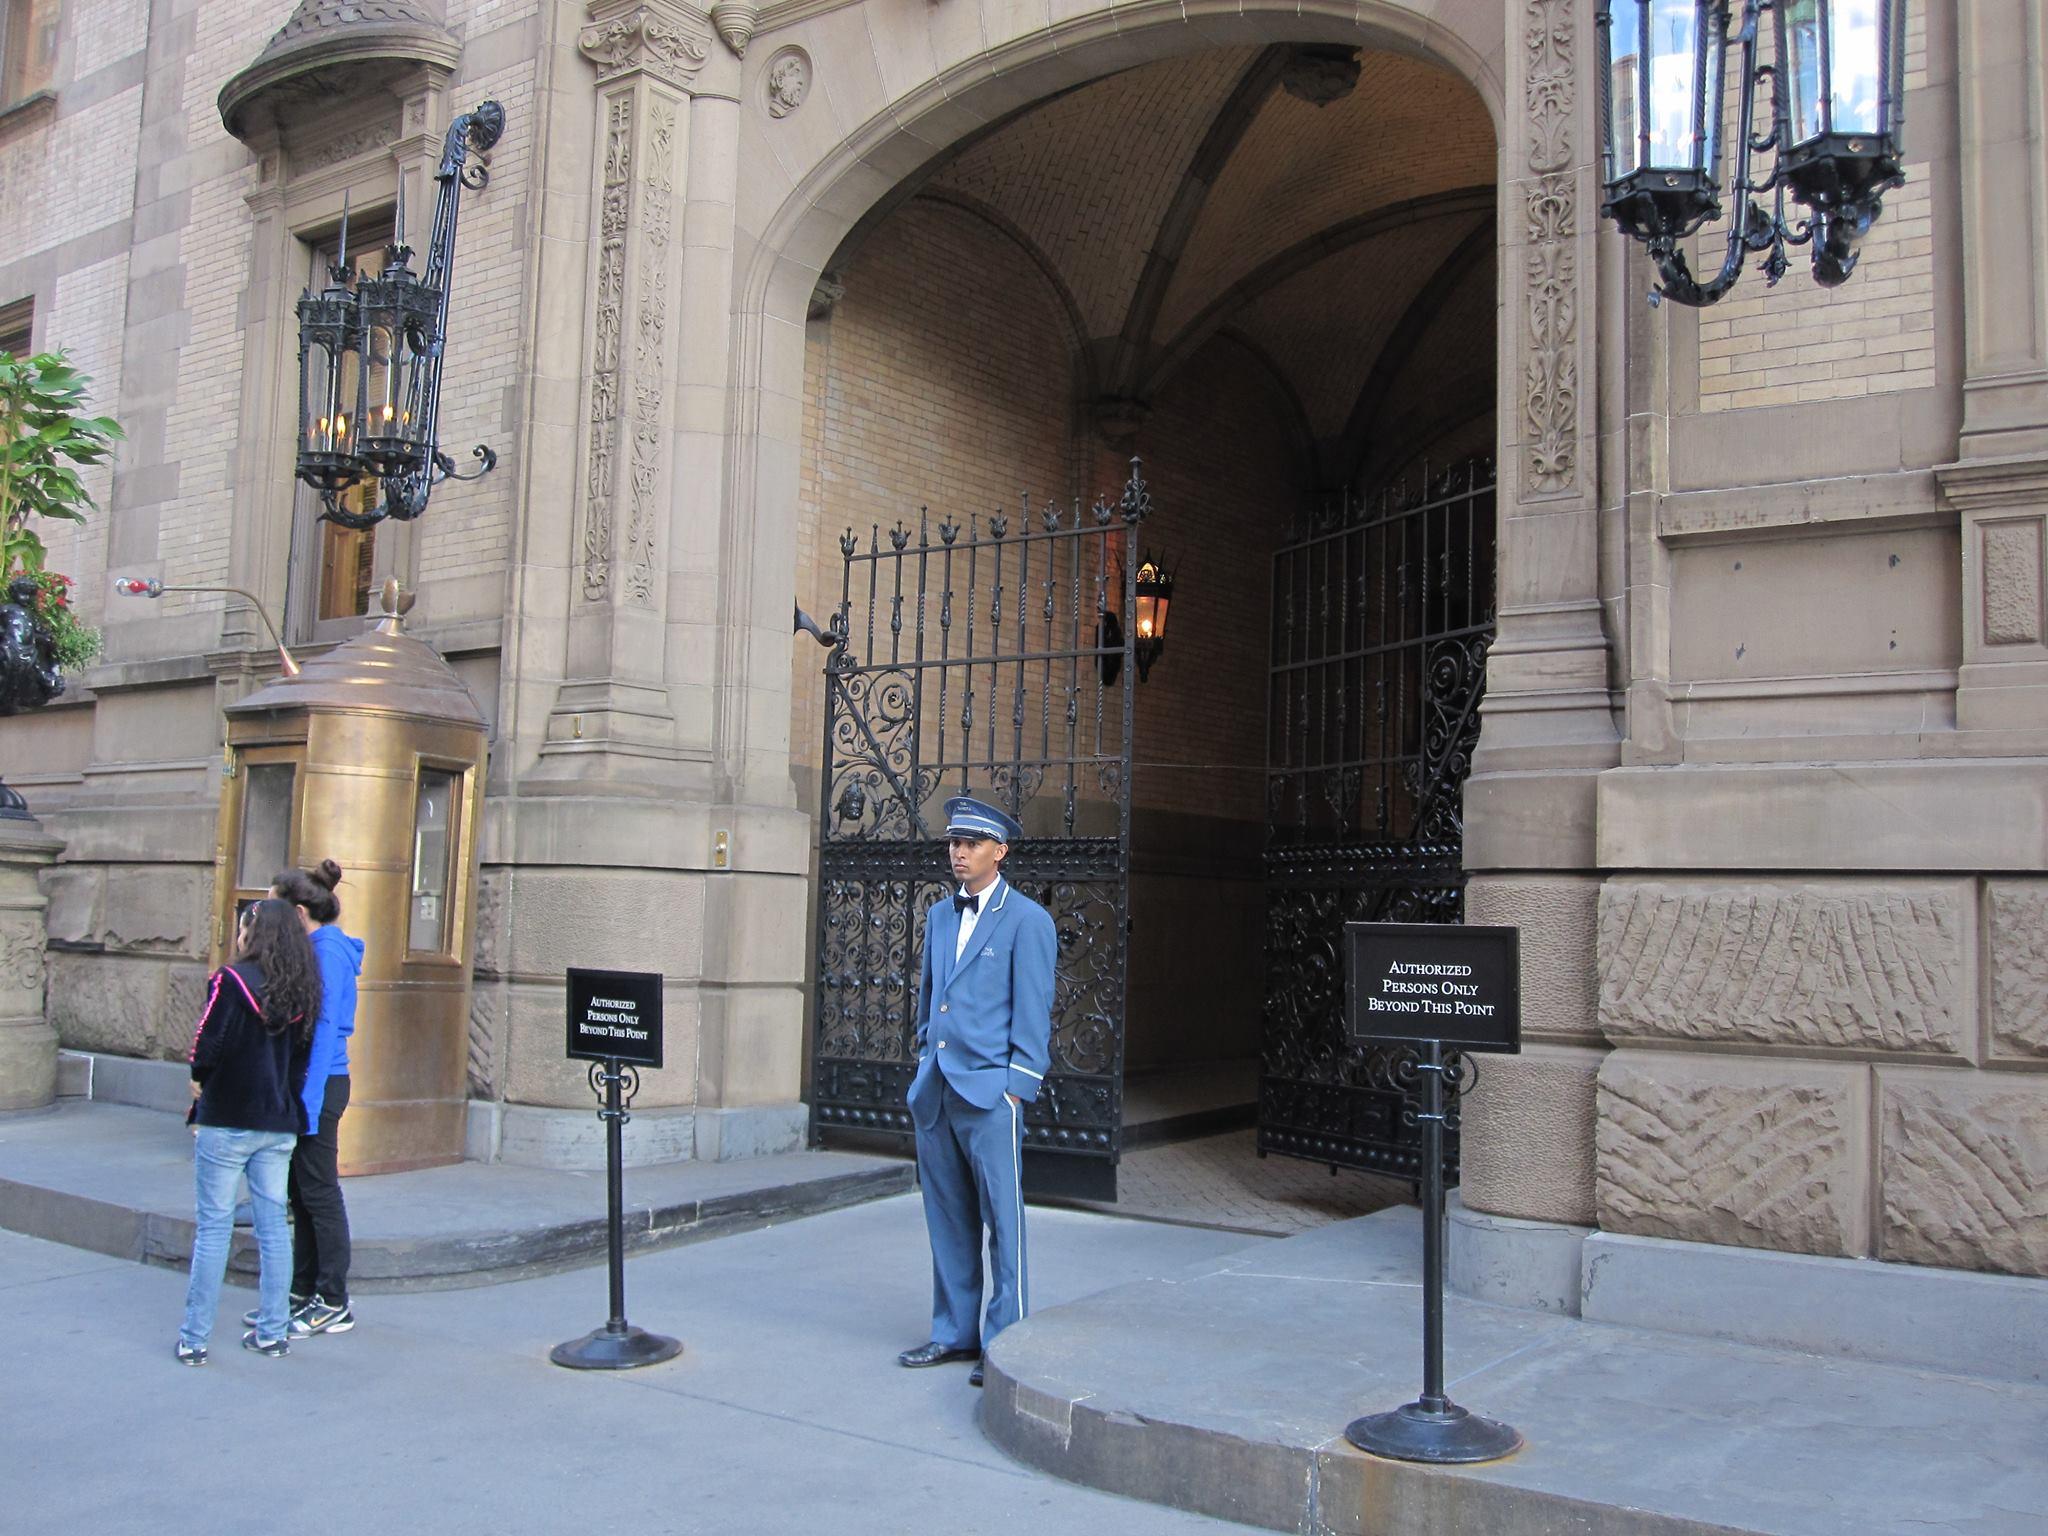 Brána bytového komplexu neďaleko newyorského Central Parku, v ktorej vrah zastrelil Johna Lennona. (Foto: Pavel Kapusta)